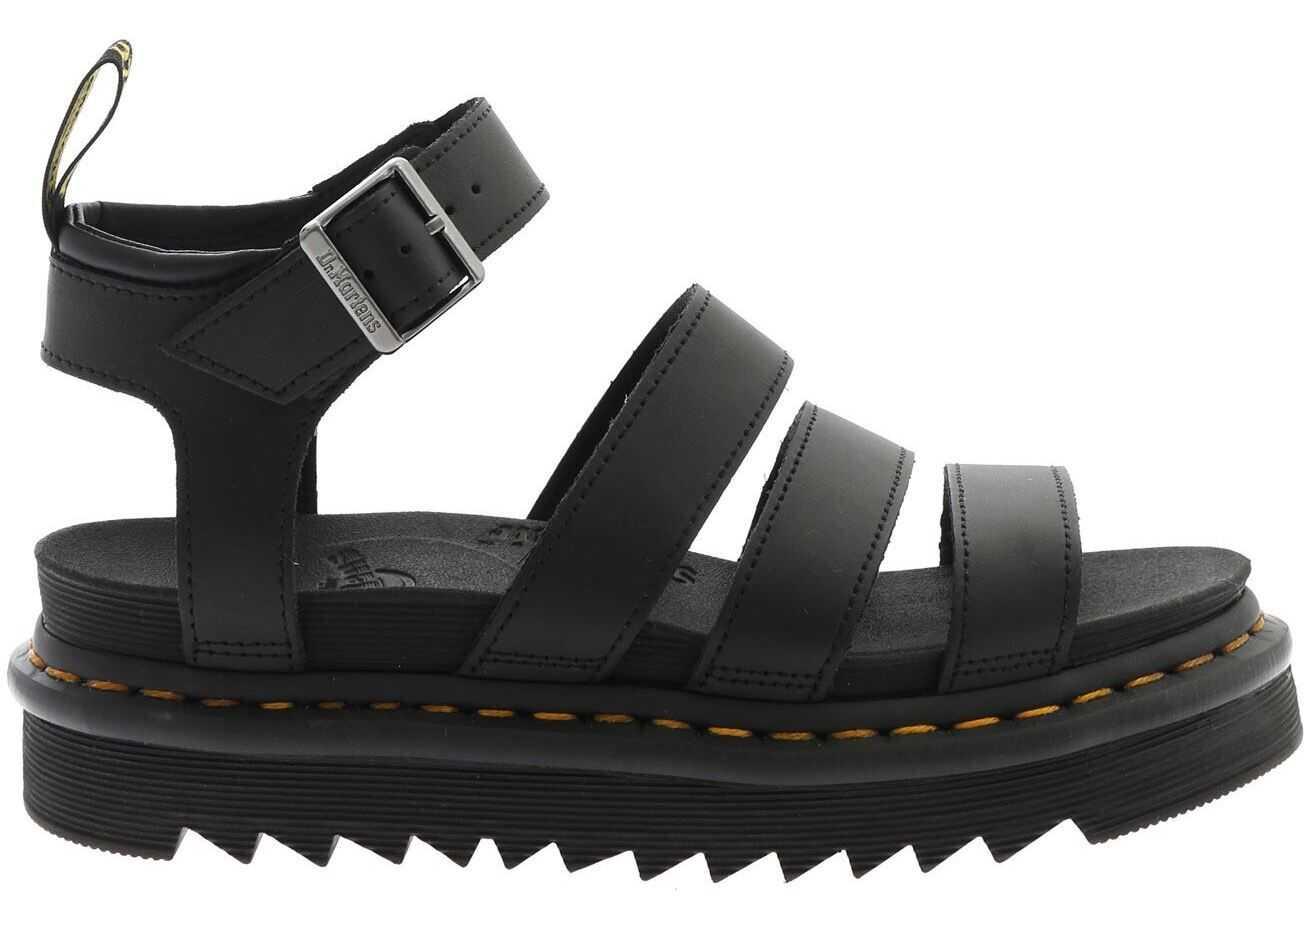 Dr. Martens Blaire Hydro Sandals In Black Black